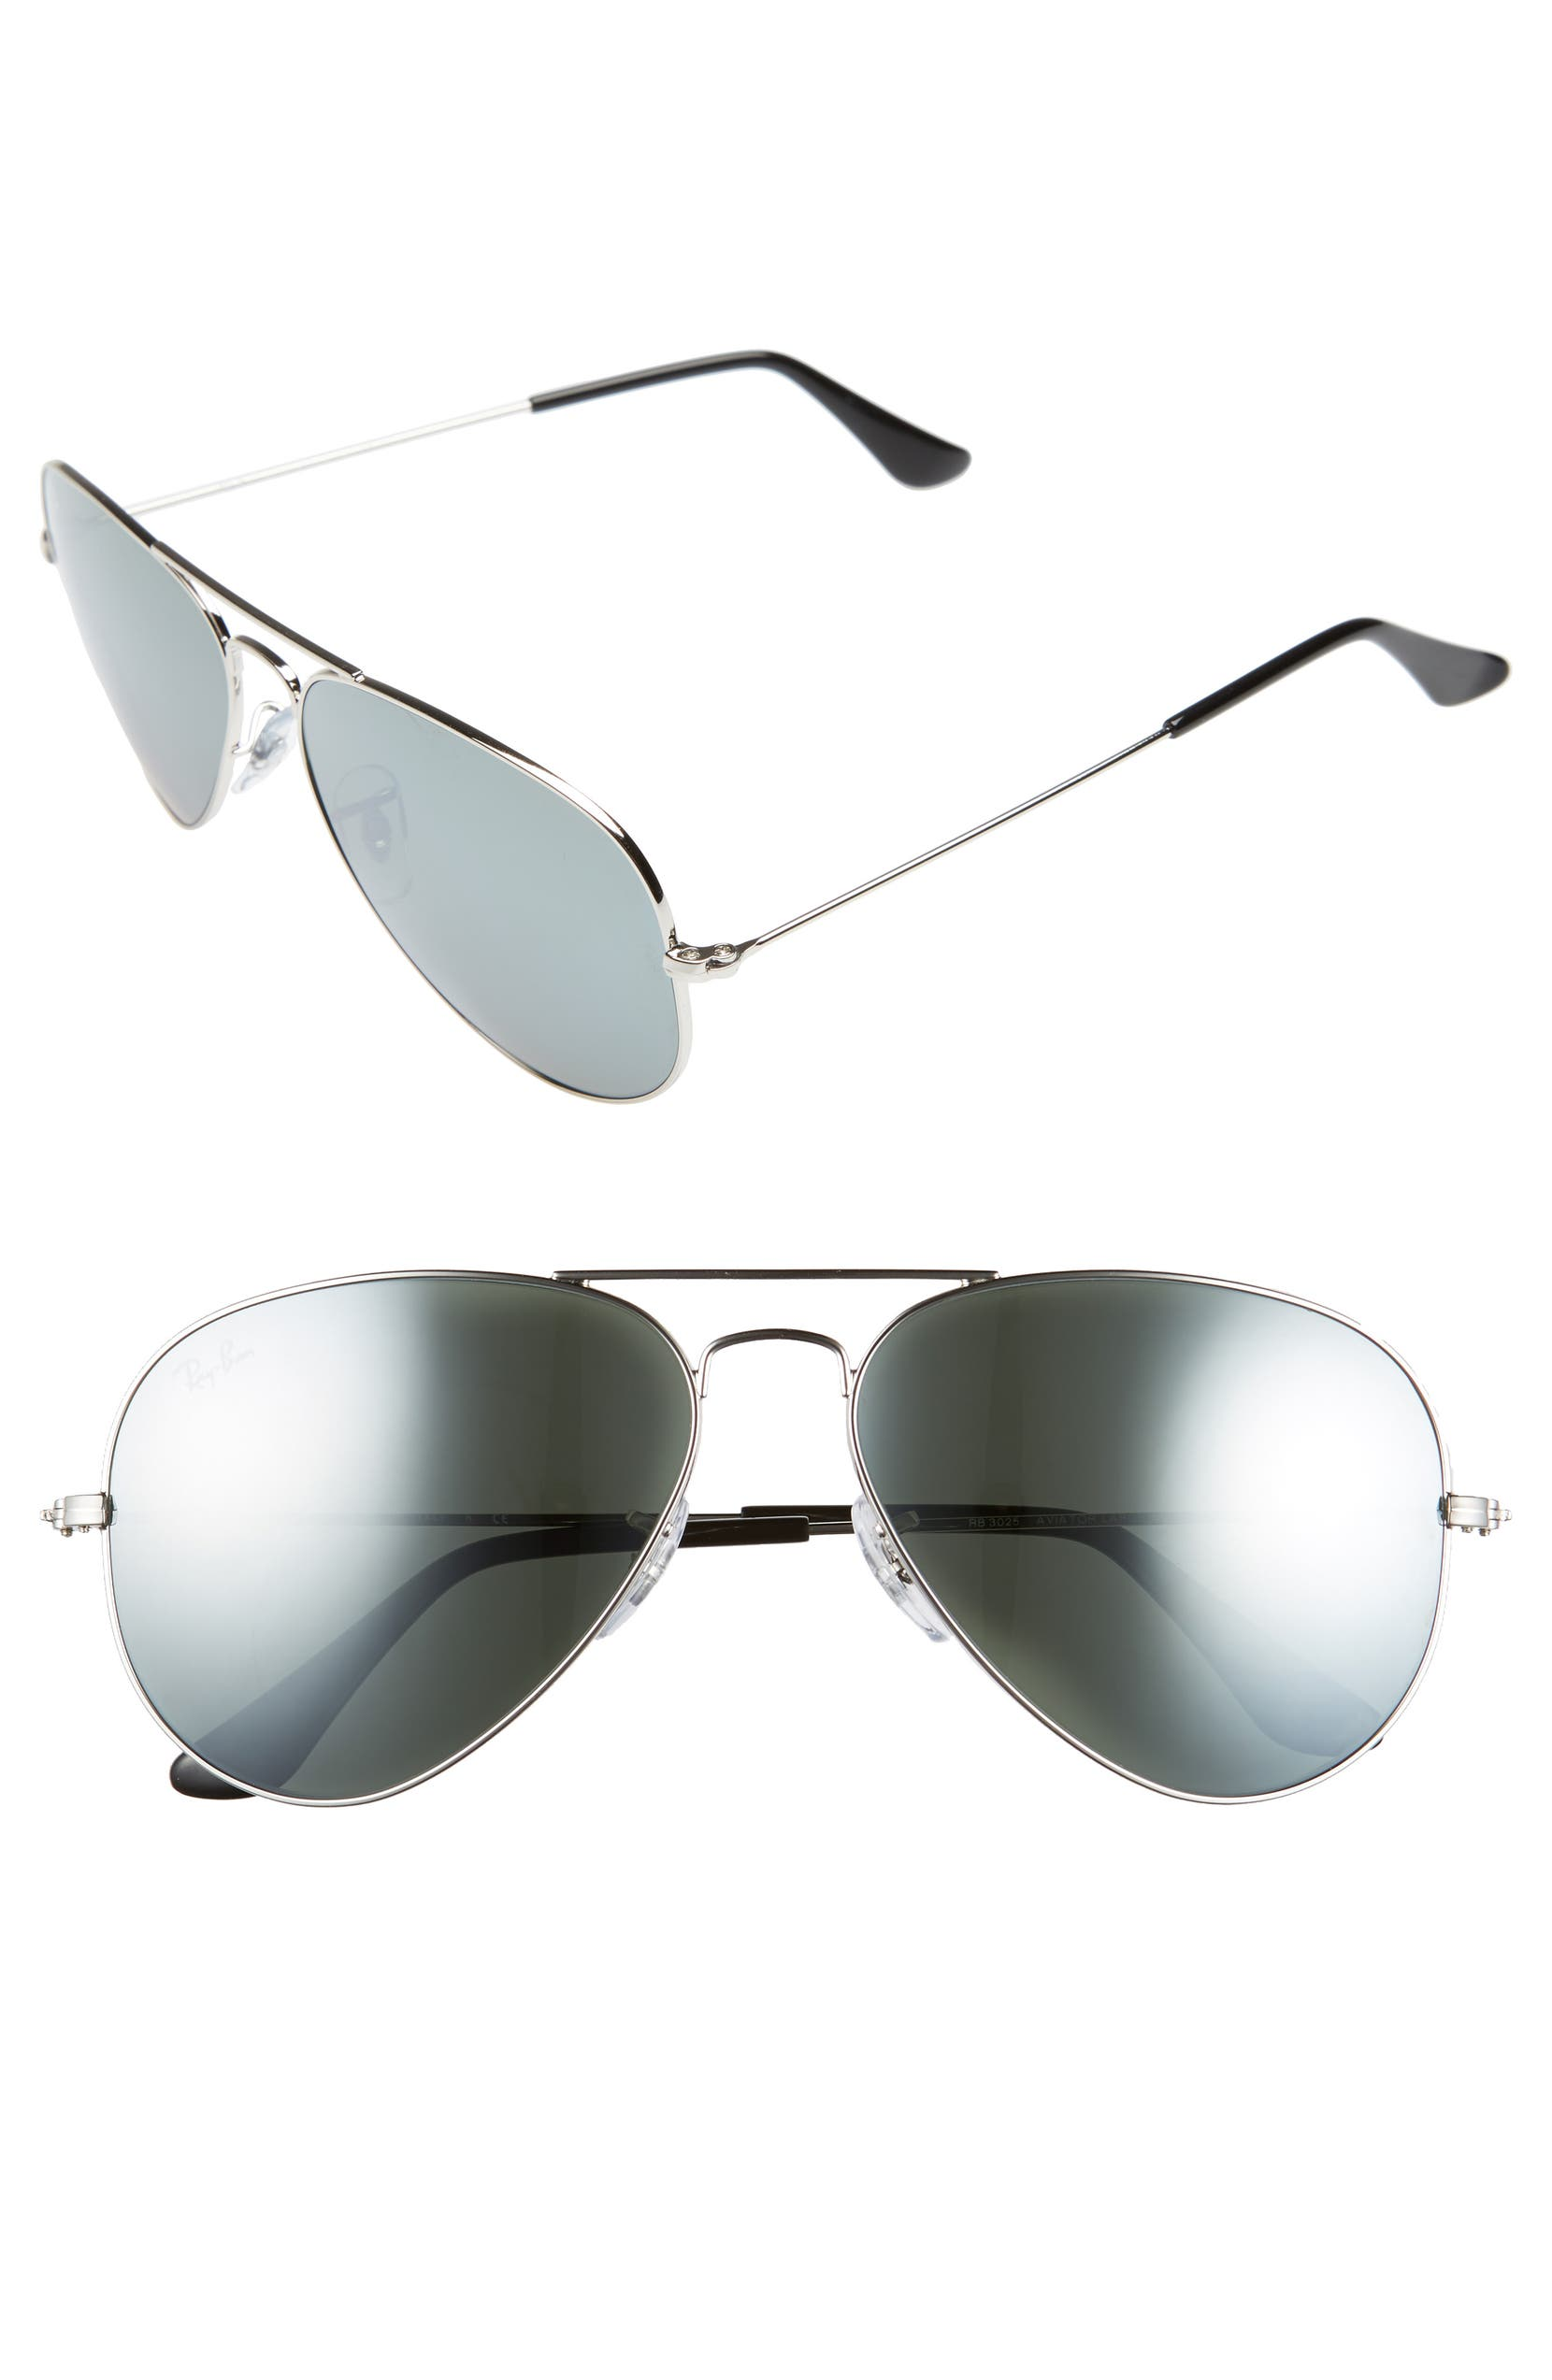 1eb0d1cd62 Ray-Ban Original Aviator 58mm Sunglasses